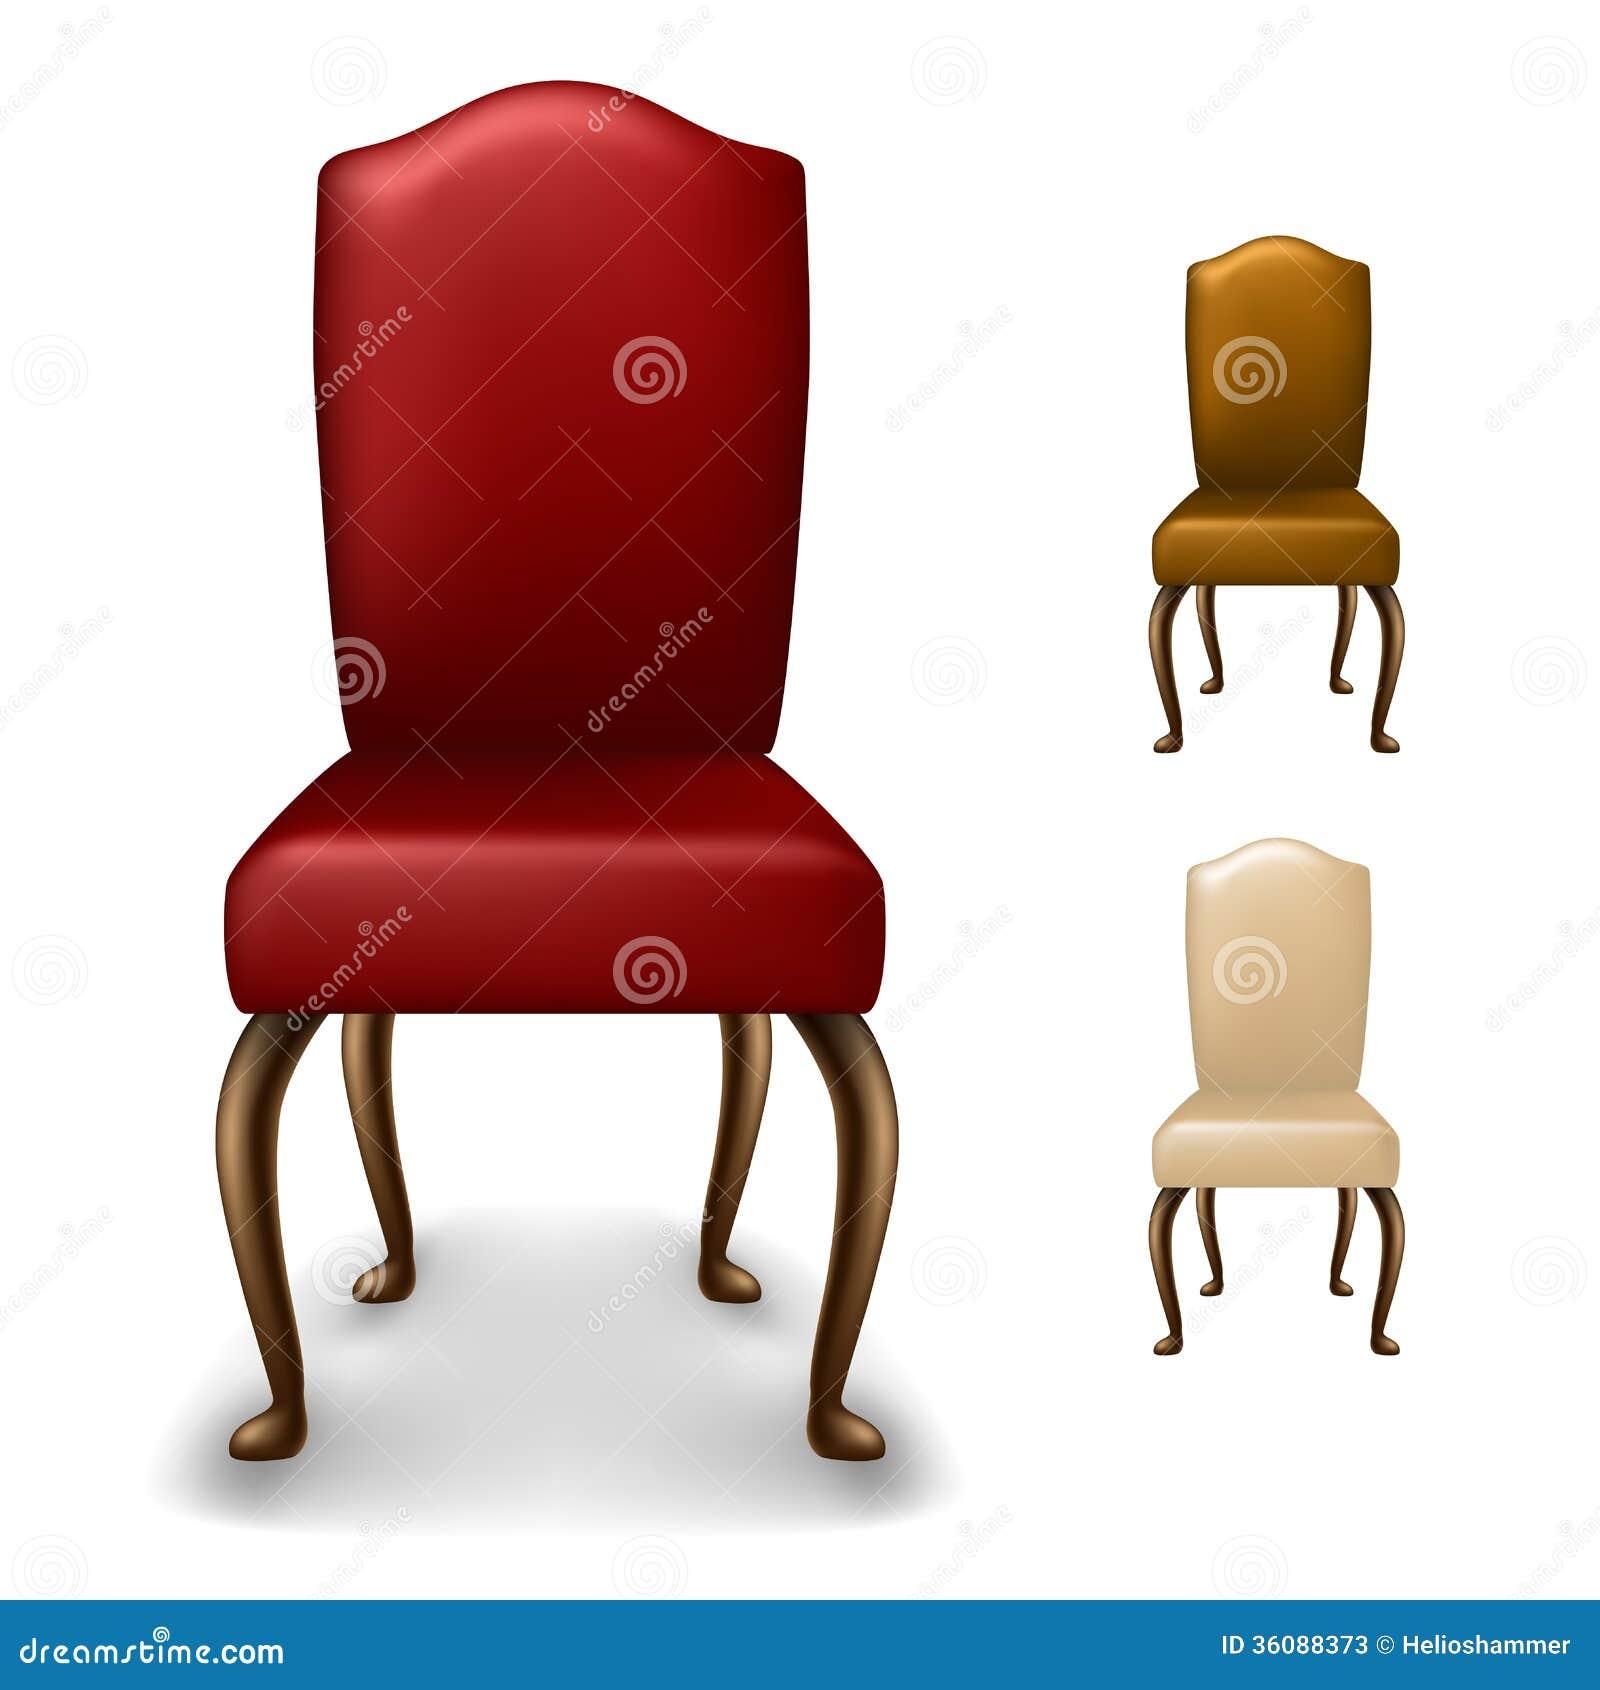 Elegant Chair Set Stock Vector Illustration Of Design 36088373